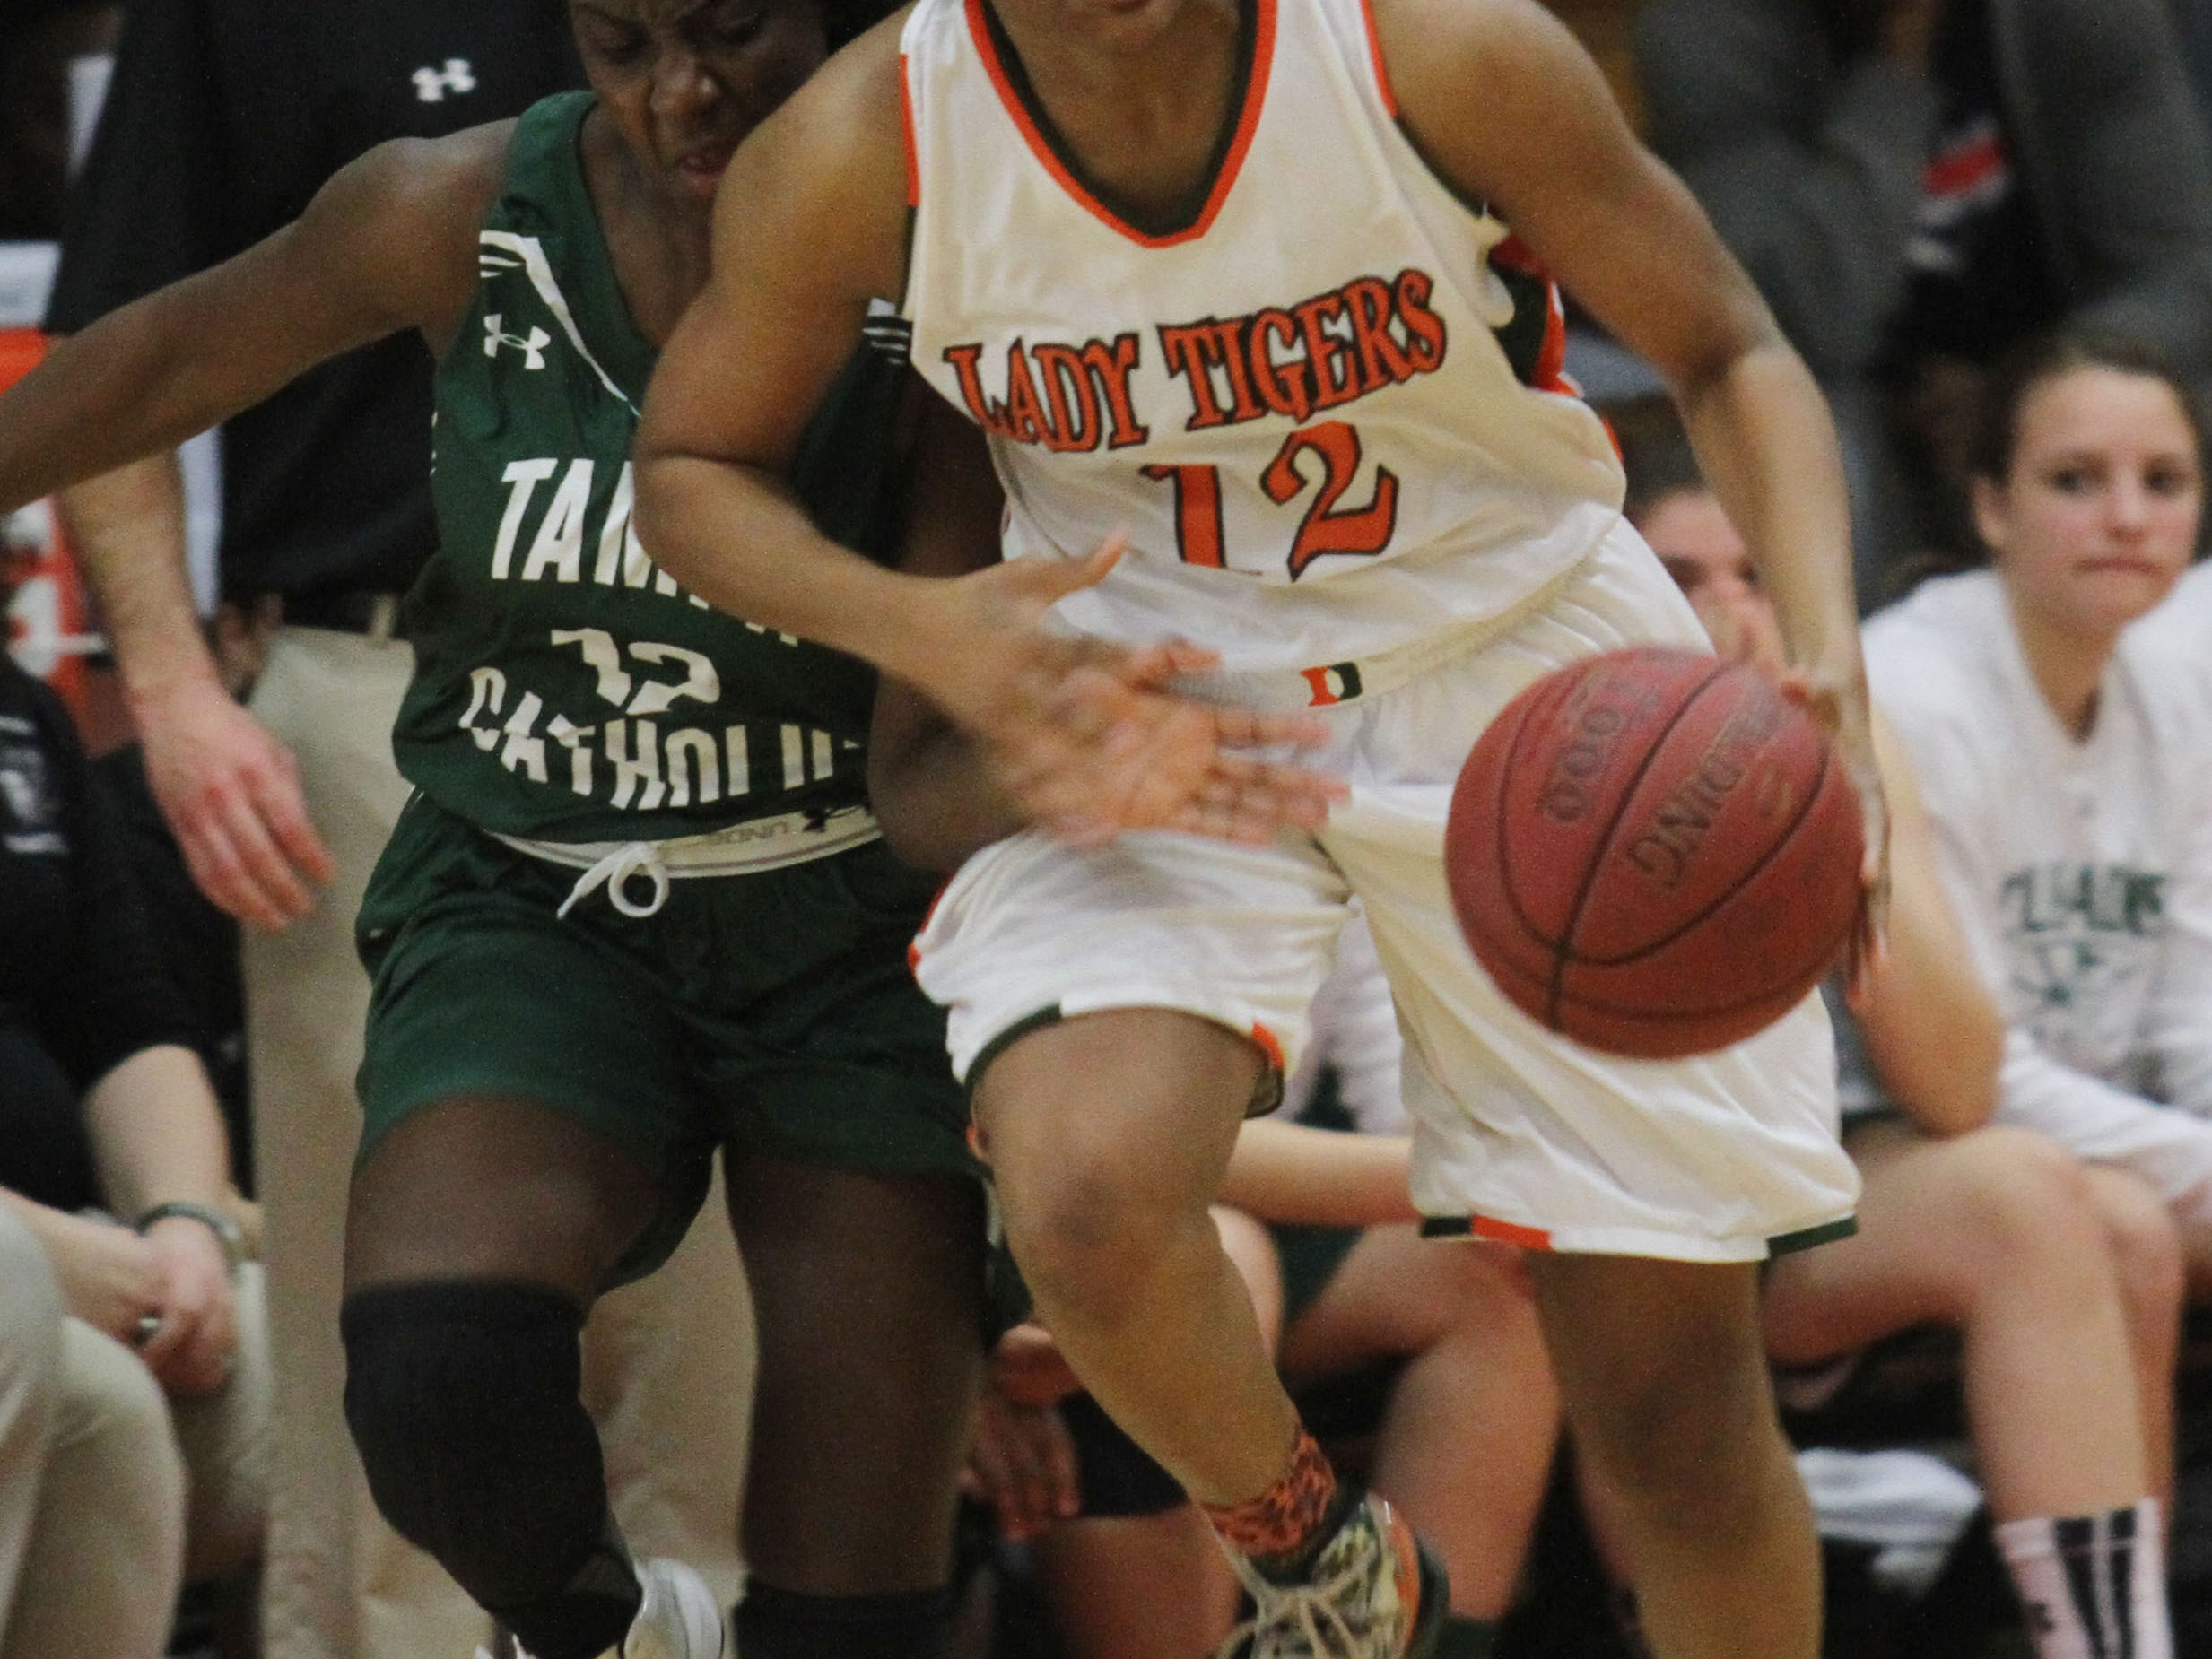 Dunbar's Kiara Desamours steals the ball from Tampa Catholic's Mia Blocker during the Region 4A-3 girls basketball championship game at Dunbar High School on Friday night.